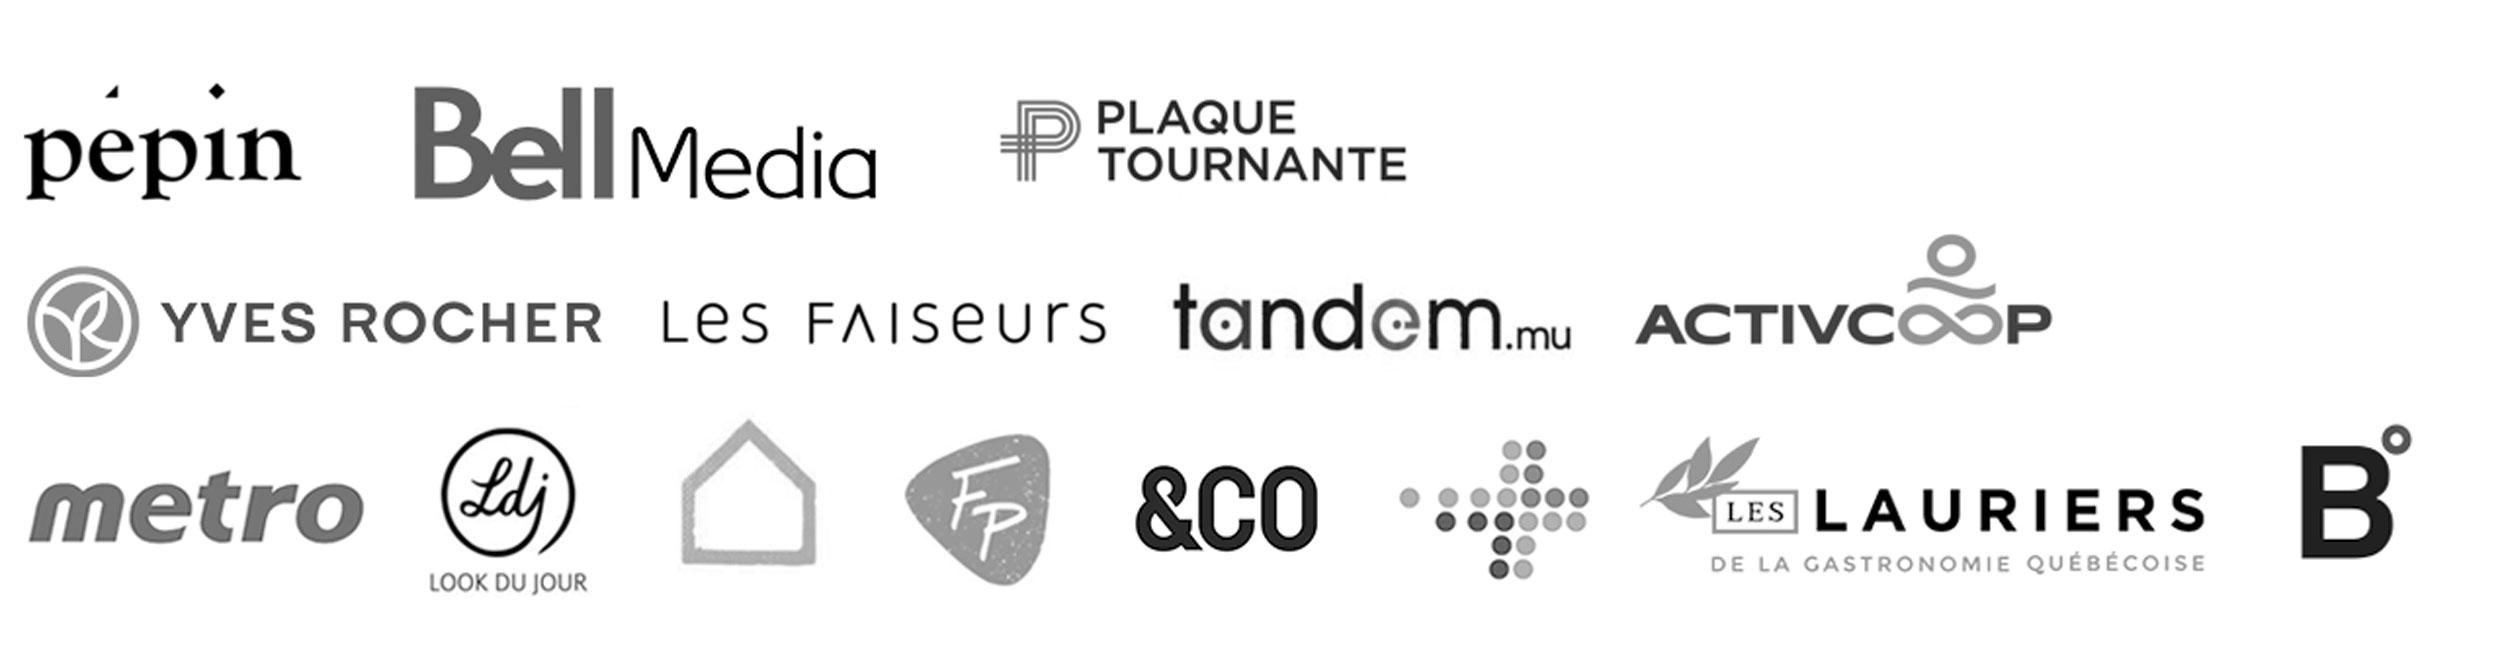 clients-marques-logo.png